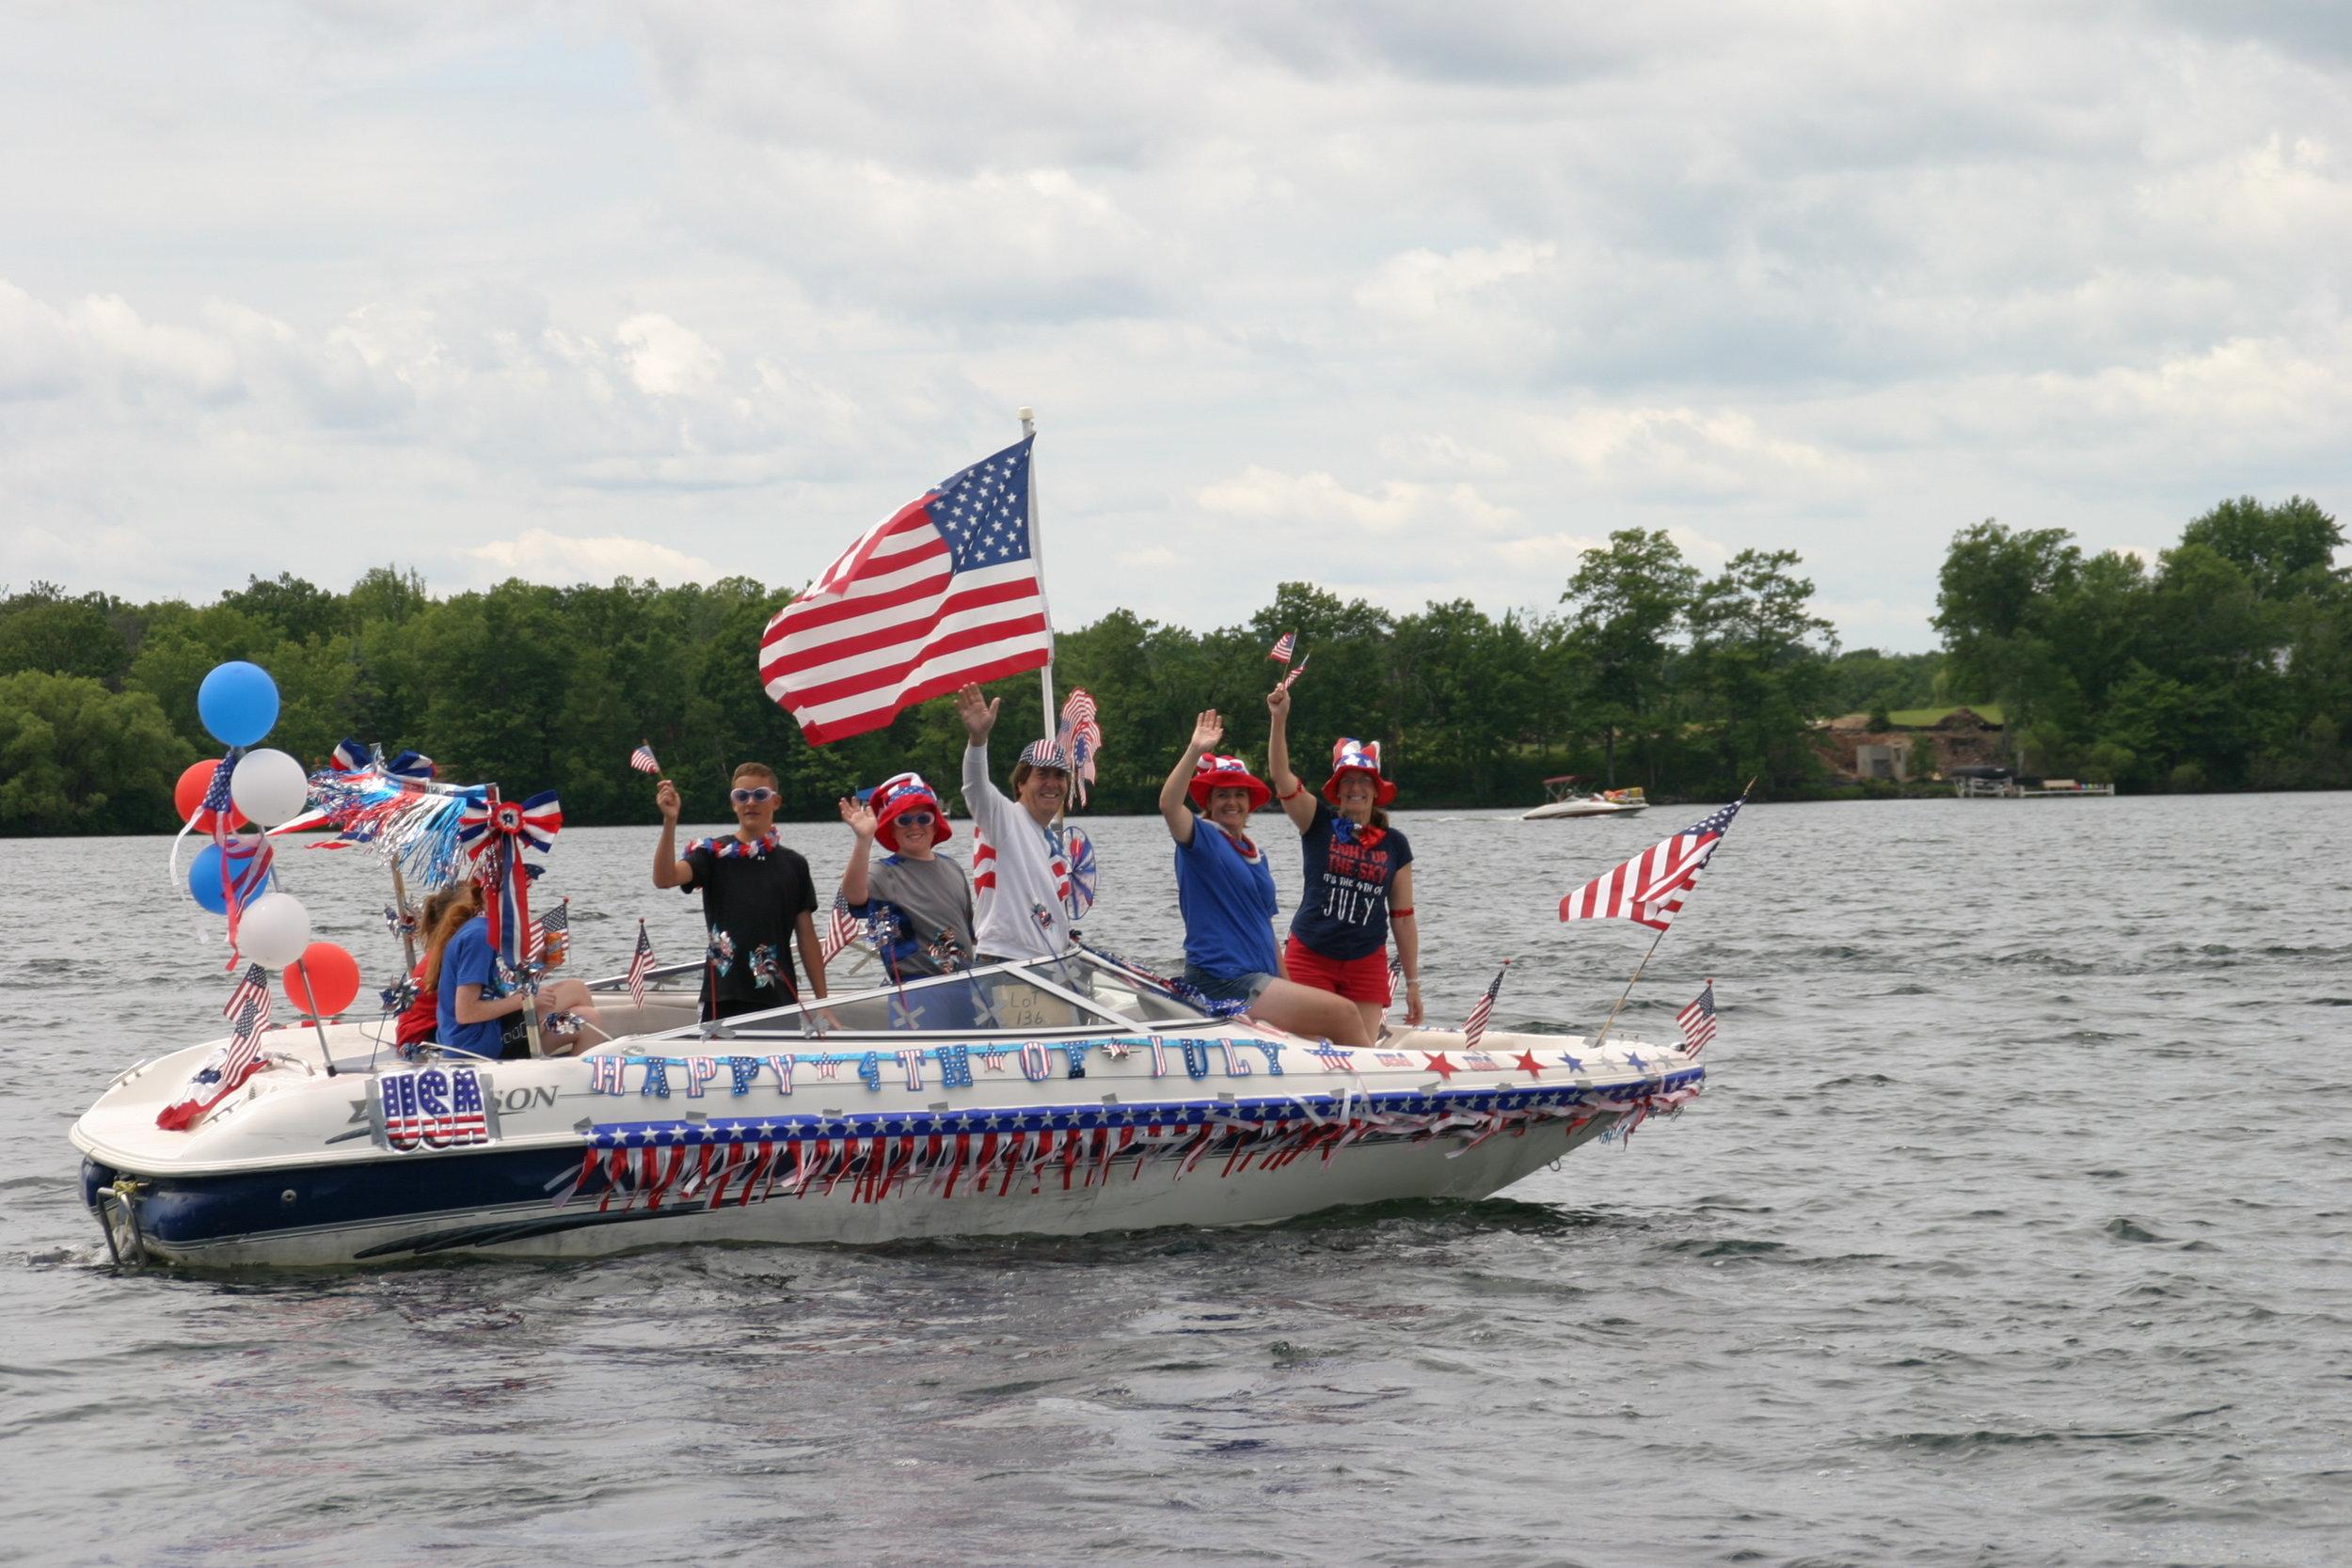 2017 Speedboat Winner